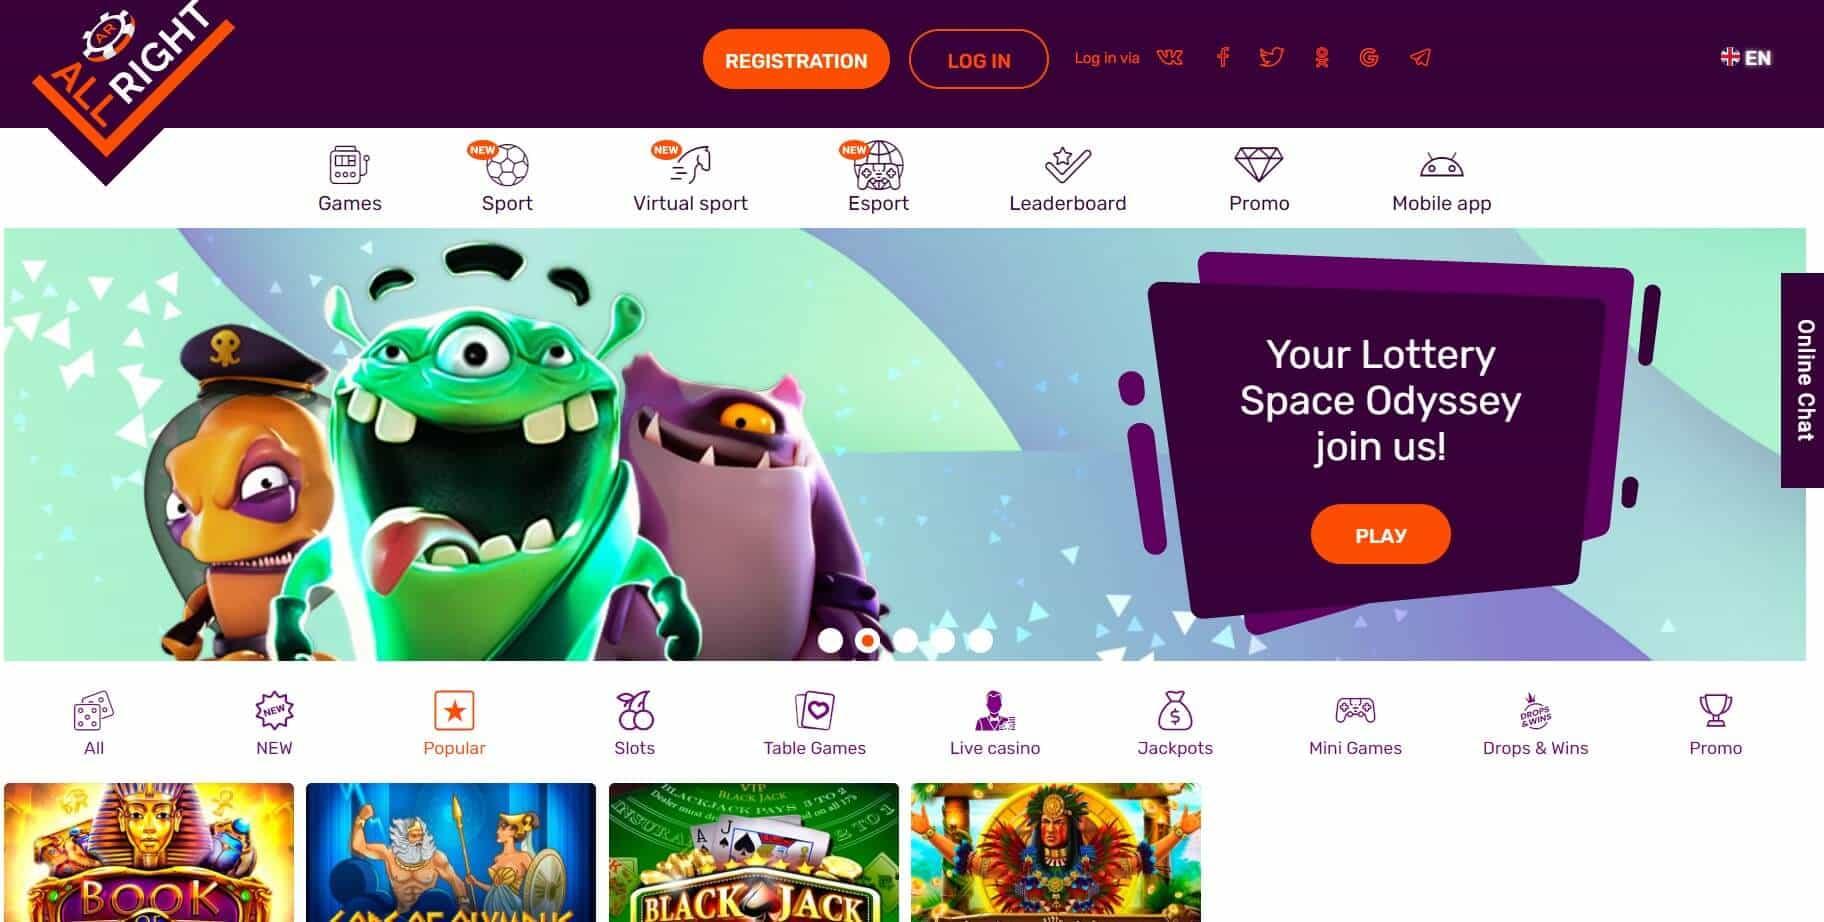 All Right casino homepage